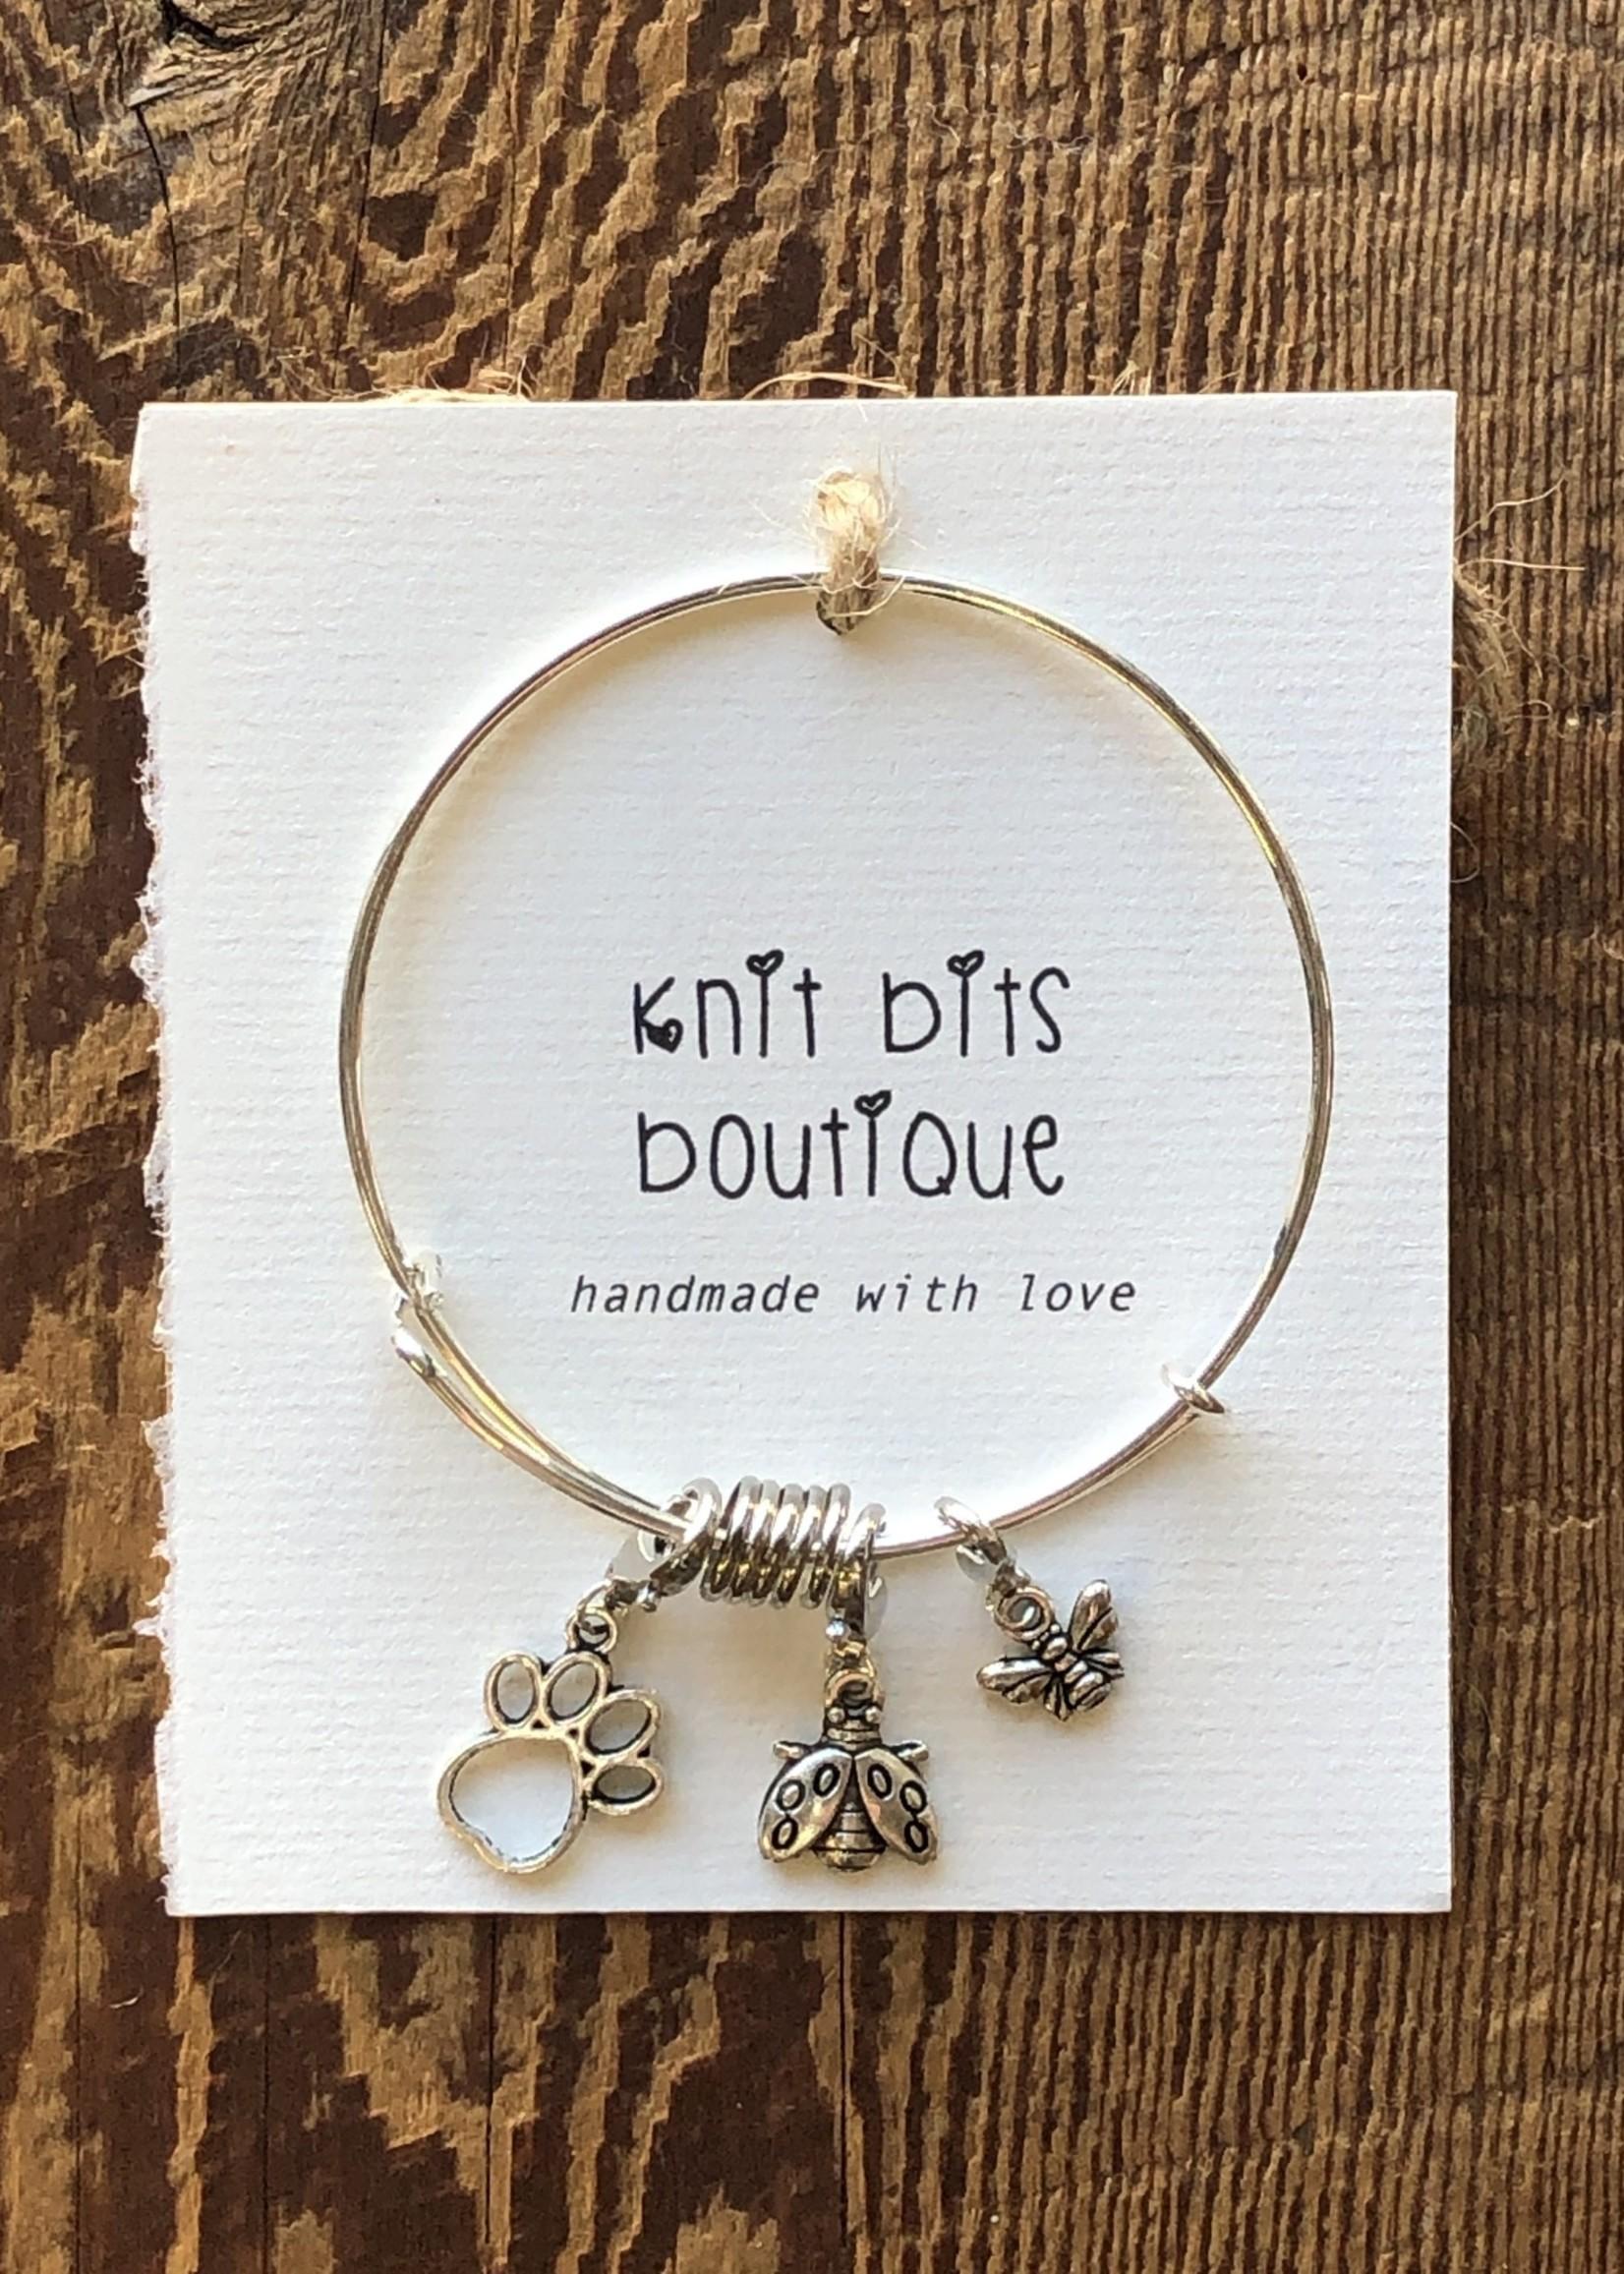 Knit Bits Boutique Bracelet Project Keepers